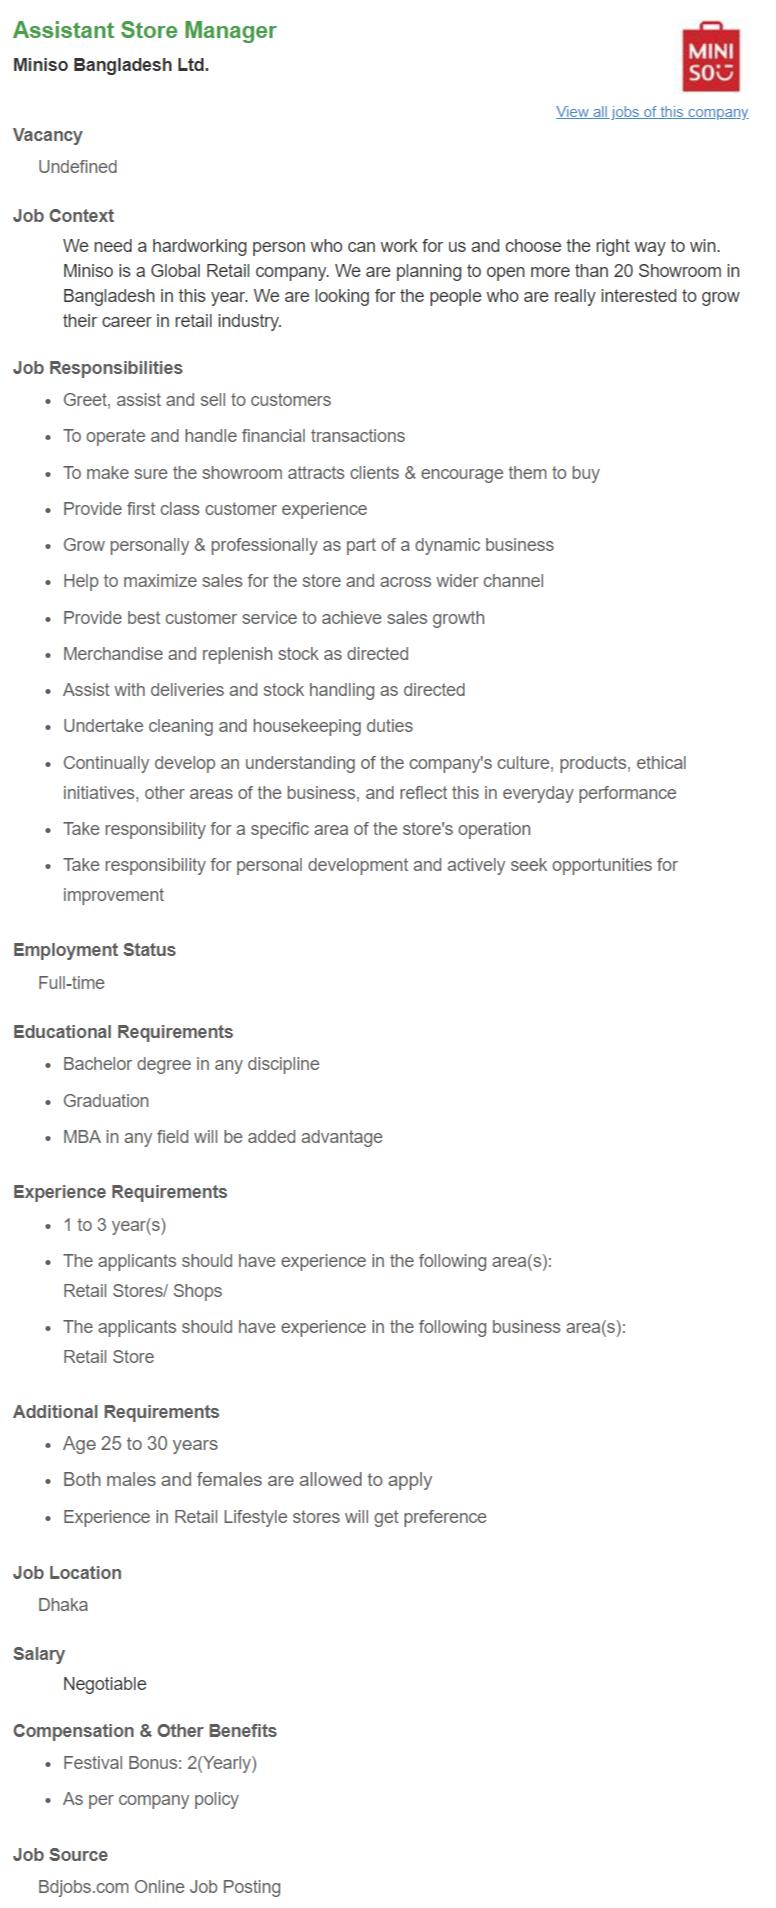 Assistant Store Manager _ Miniso Bangladesh Ltd __ Bdjobs.com